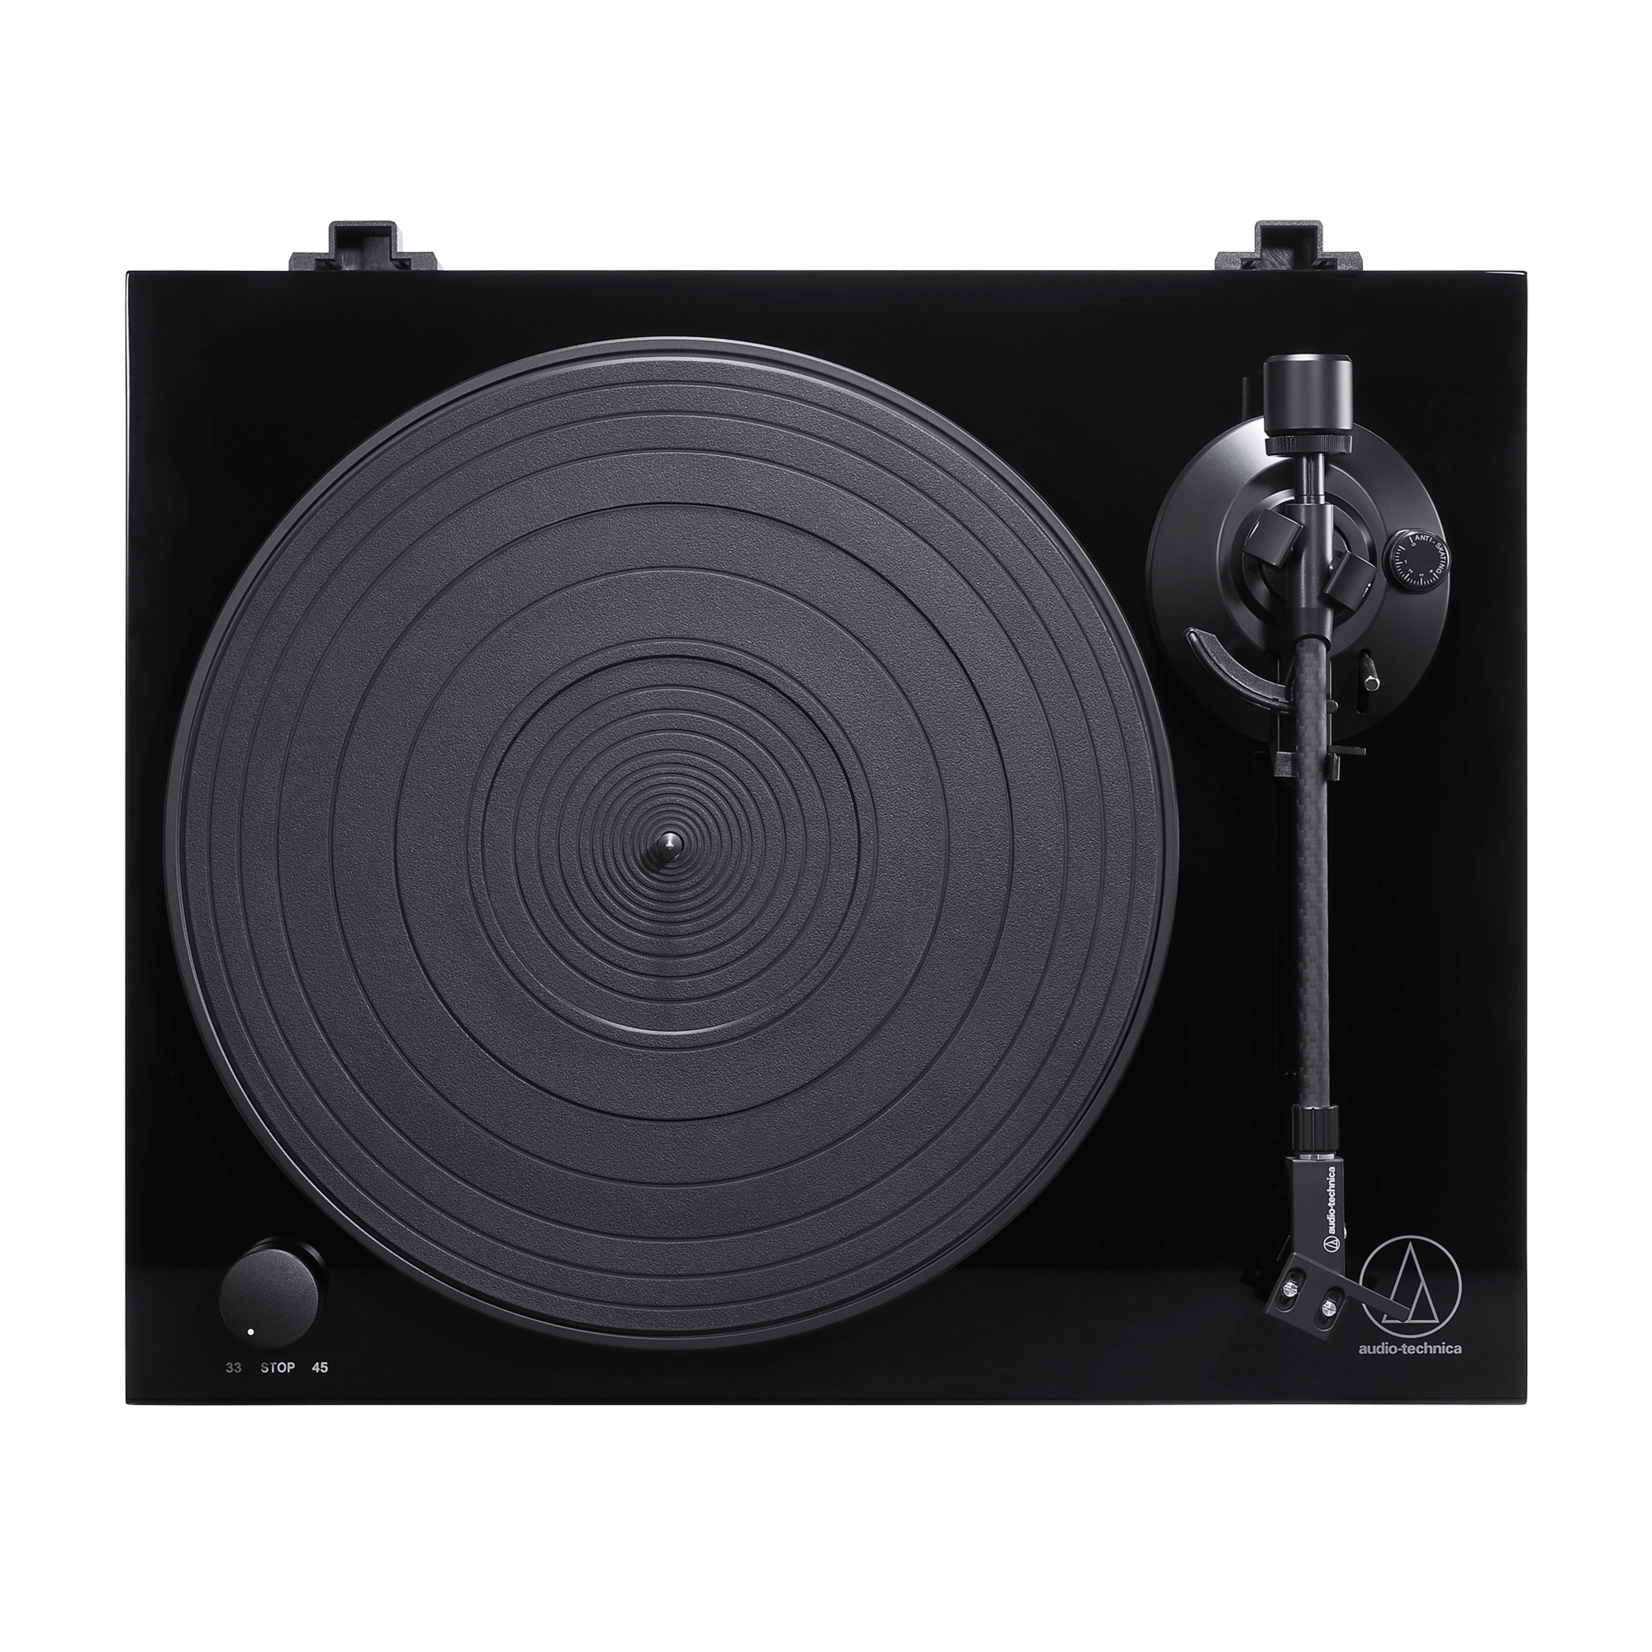 AUDIO-TECHNICA AT-LPW50PB  TURNTABLE